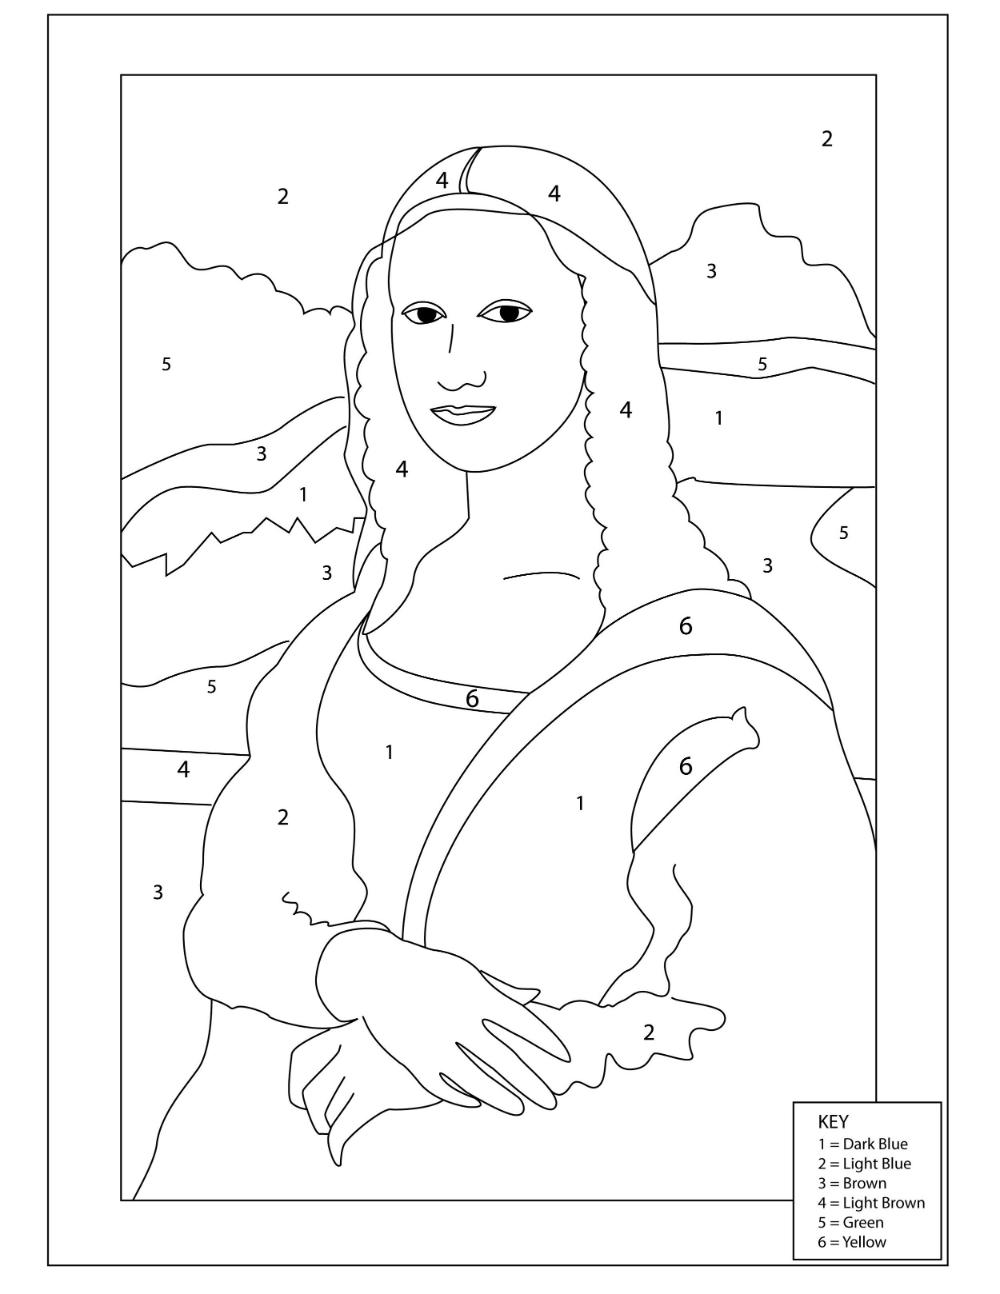 Mona Lisa Coloring Page Printable Mona Lisa Drawing Art Coloring Pages